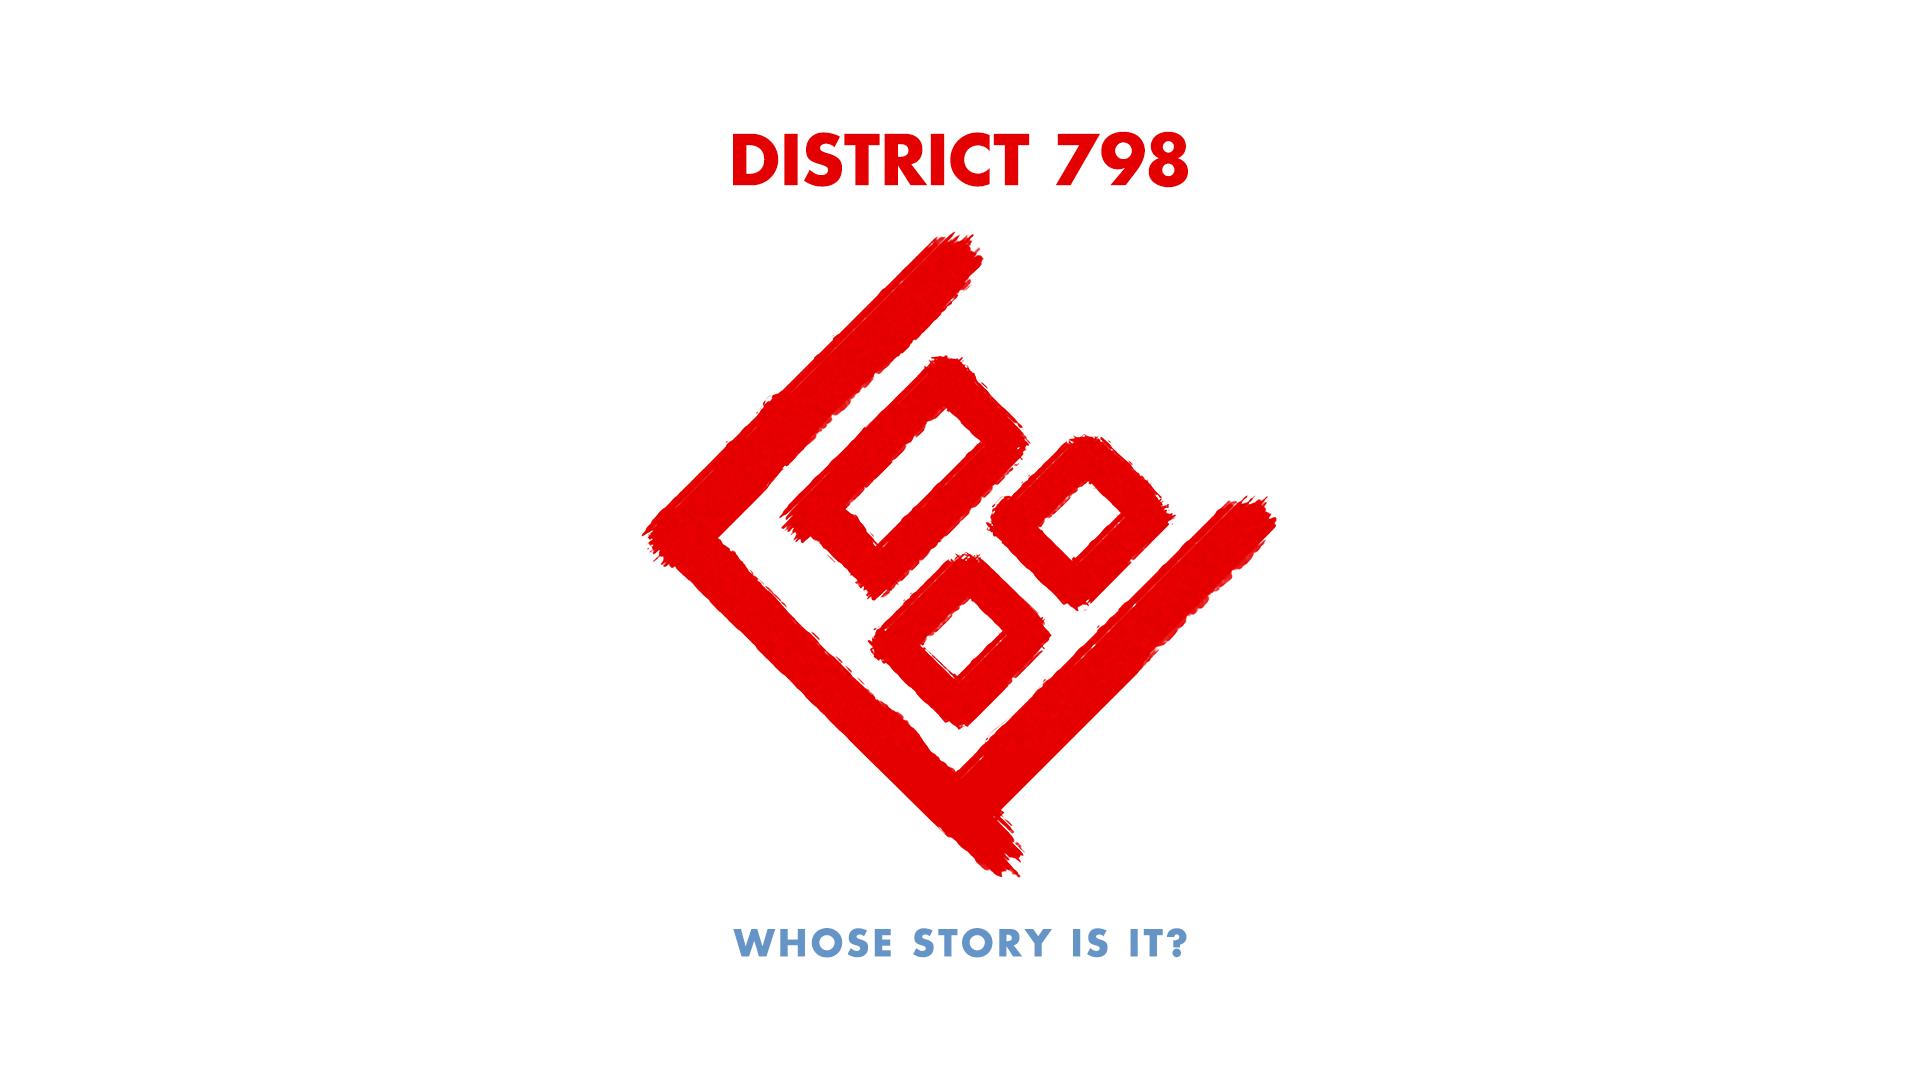 TT_D798_Site_Home_3.png